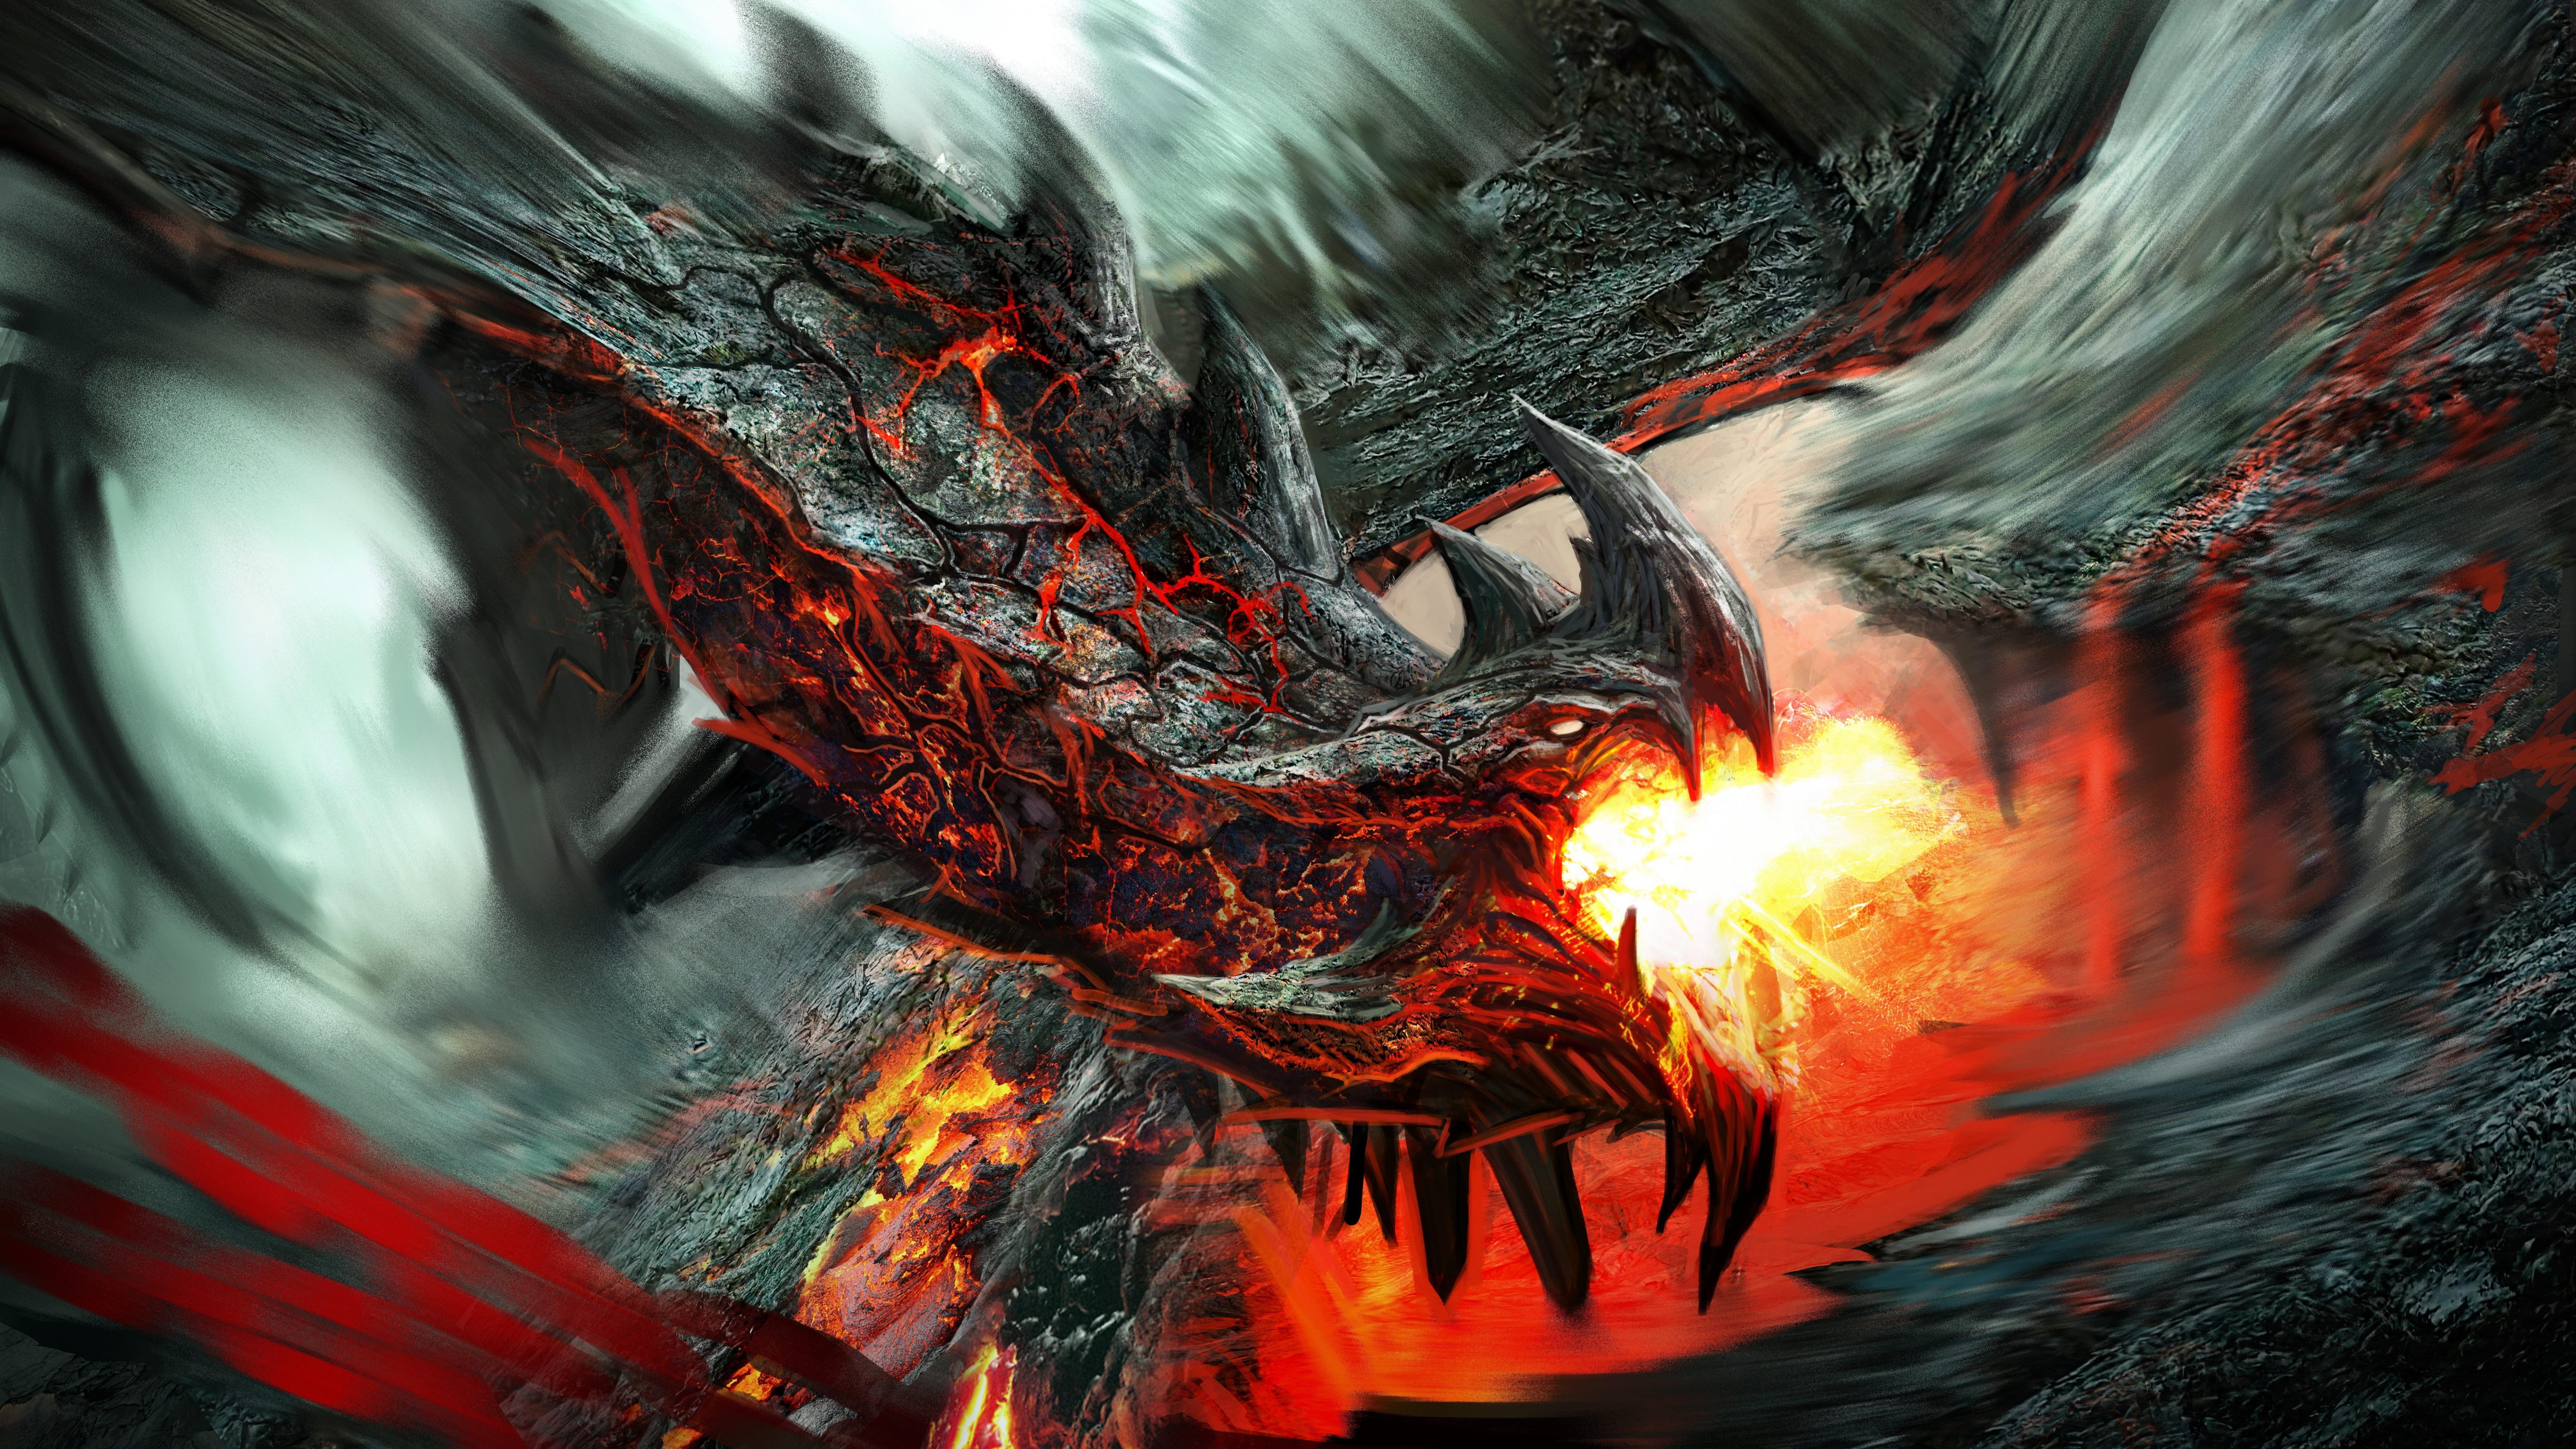 Fire Dragon fantasy art wallpaper